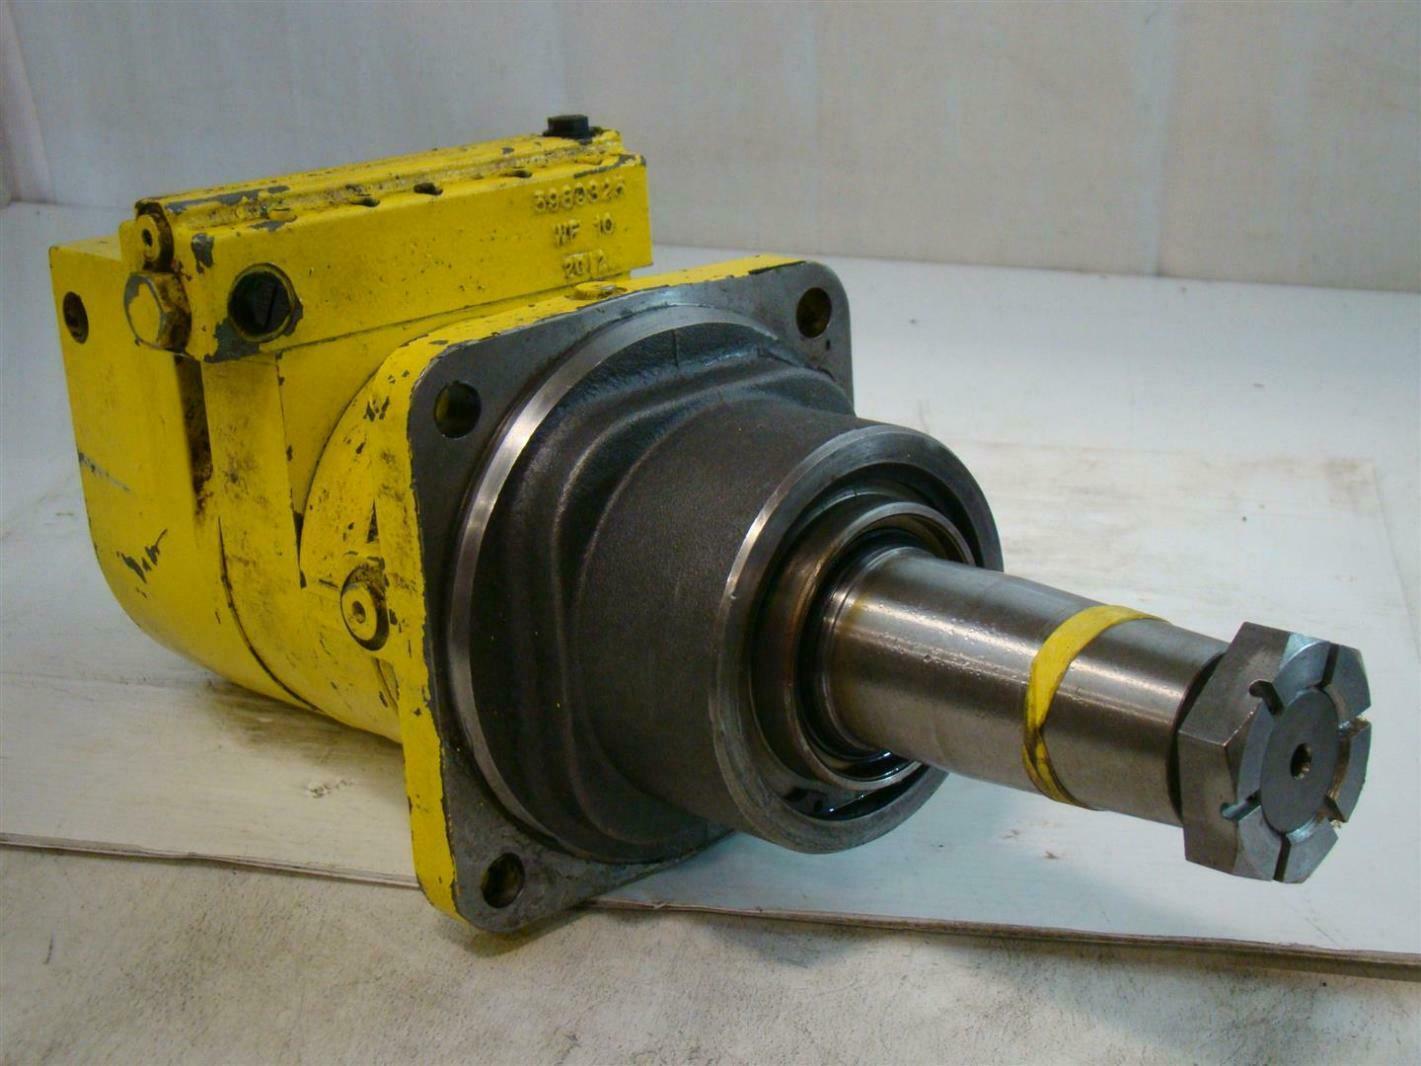 Eaton Hydraulic Motor 5989326 191 0035 002 Joseph Fazzio